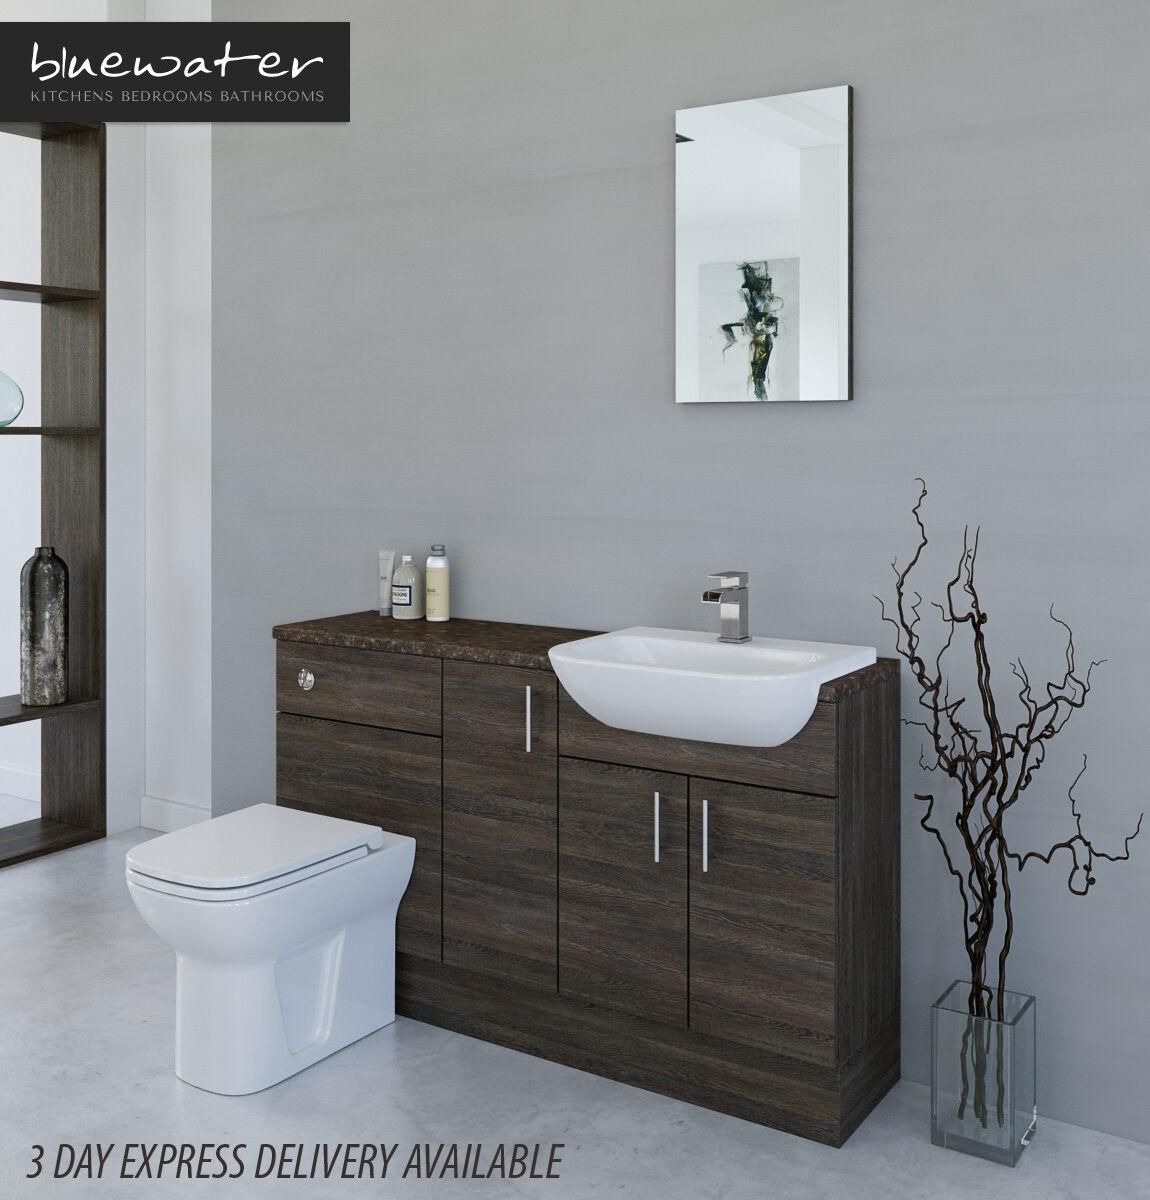 Fitted Bathroom Furniture Manufacturers: MALI WENGE BATHROOM FITTED FURNITURE 1400MM